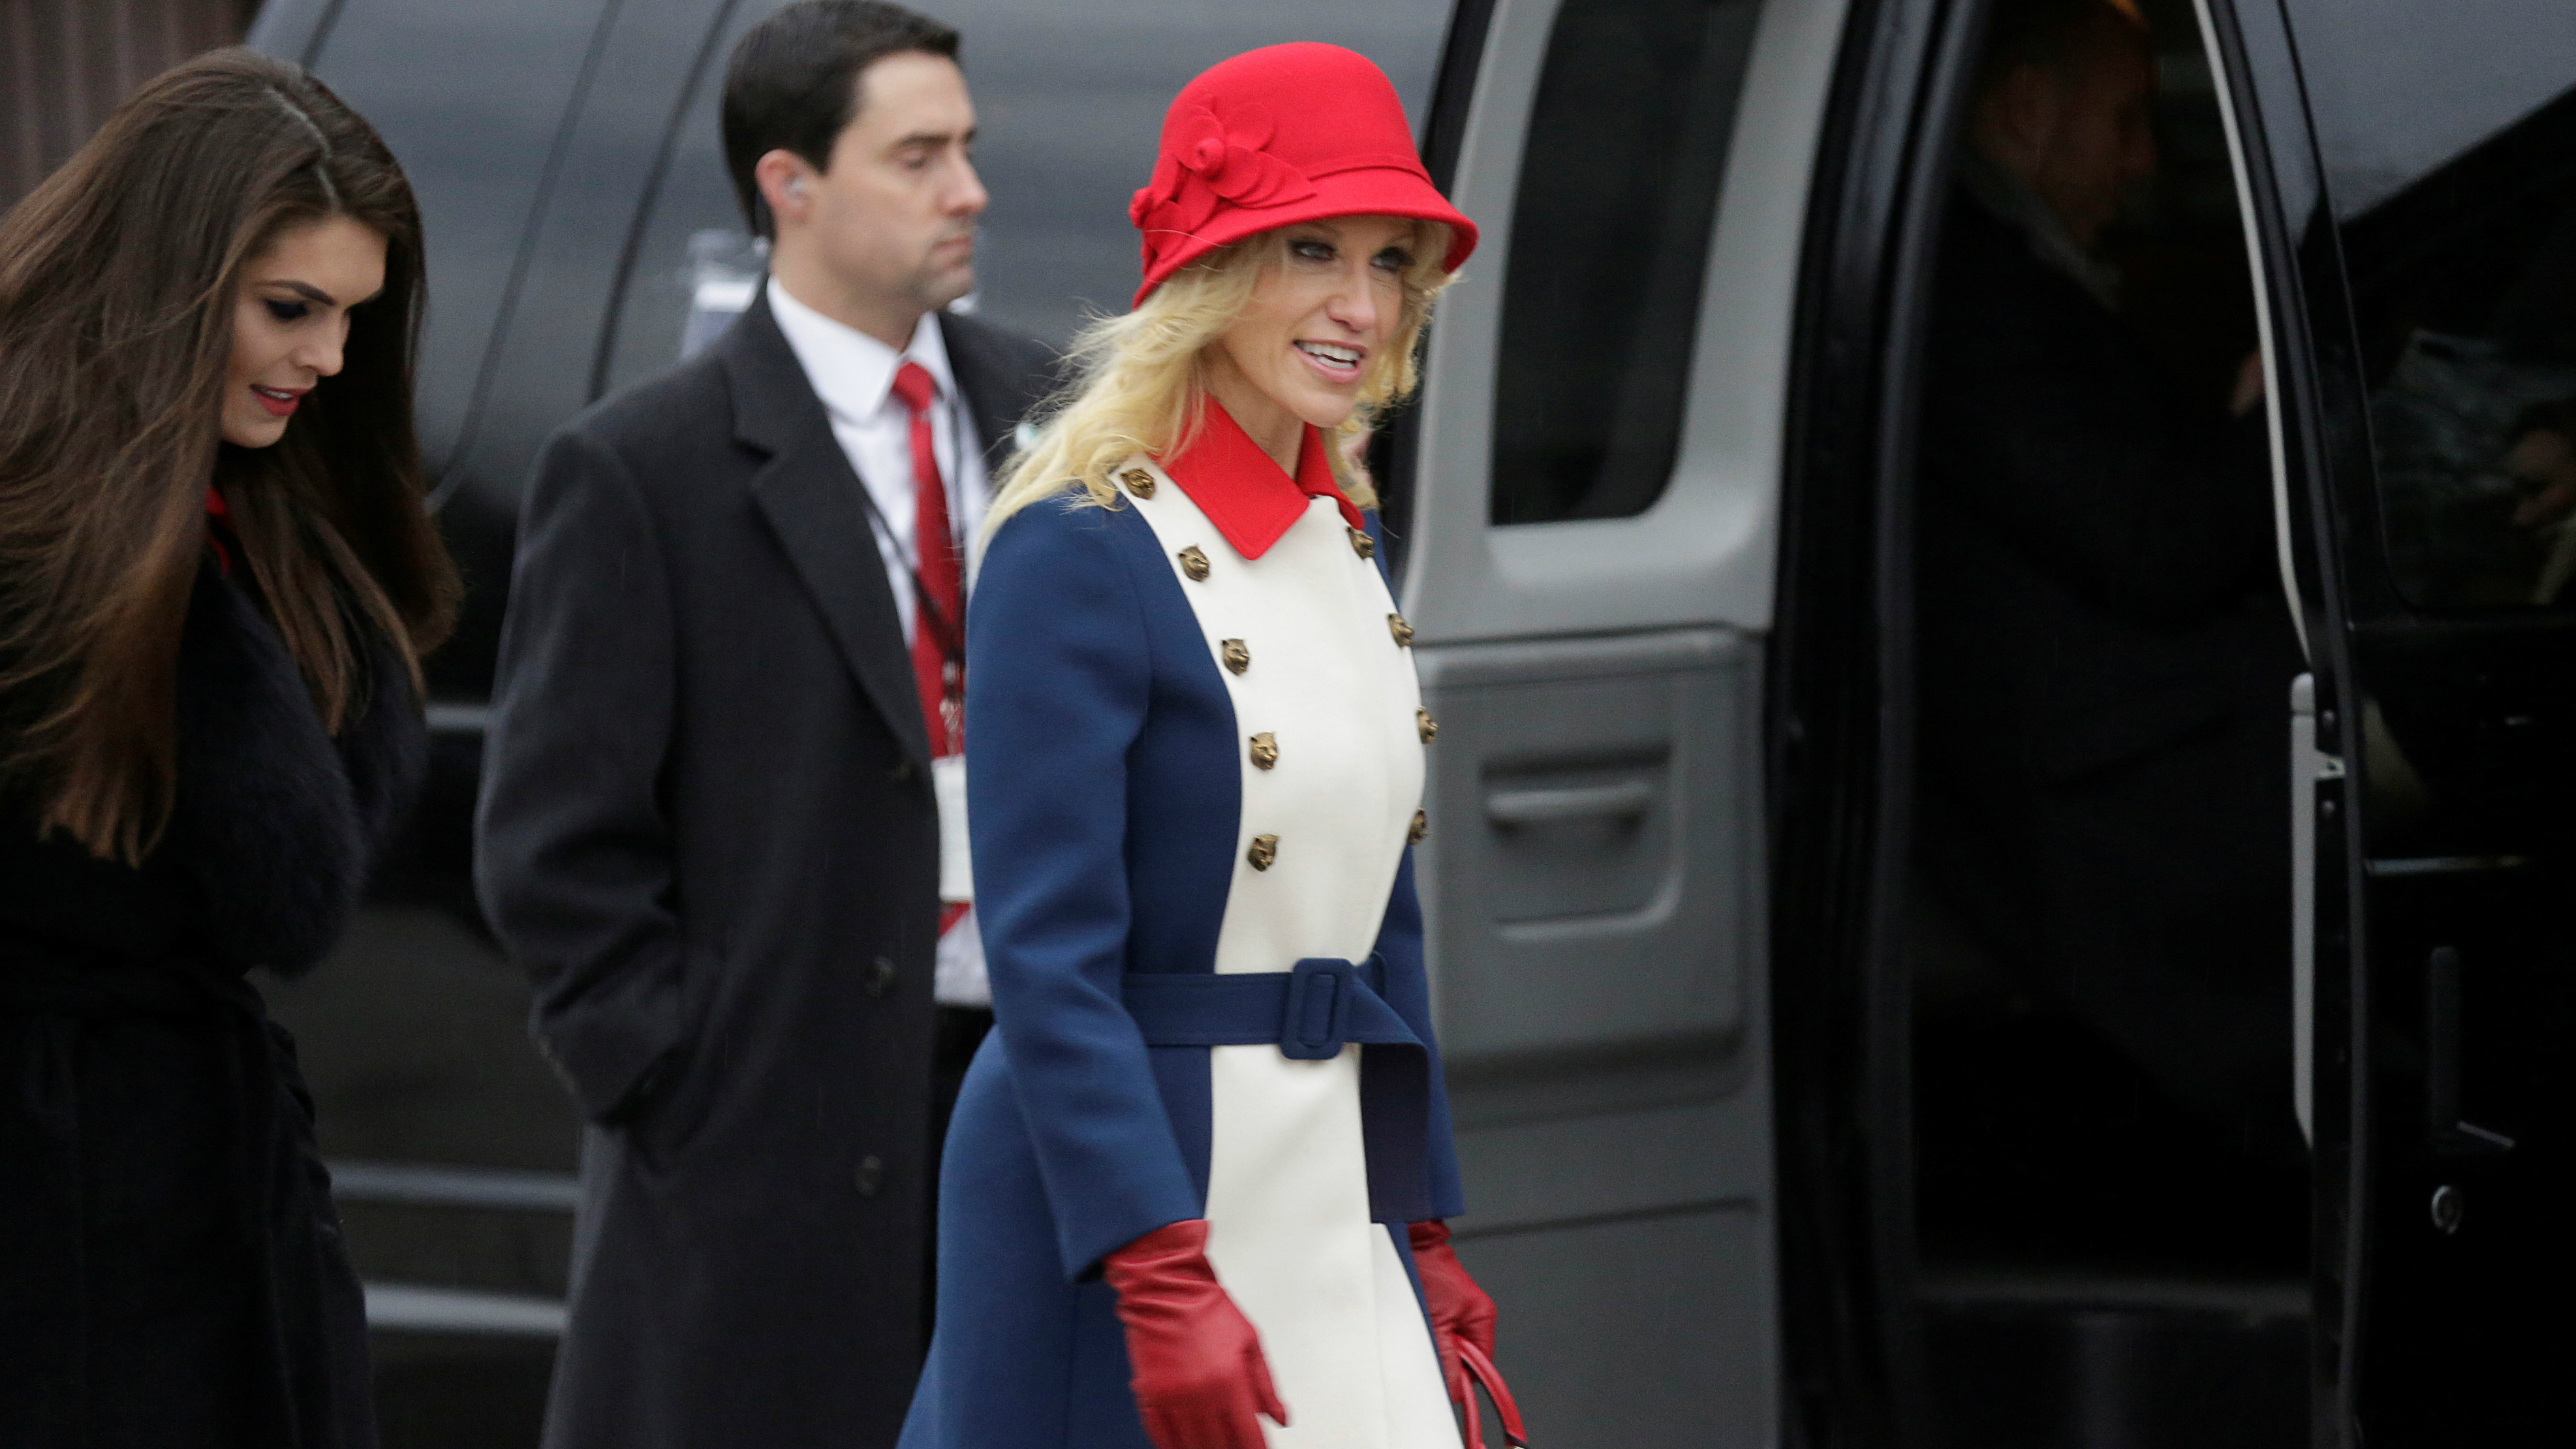 gucci red white blue coat